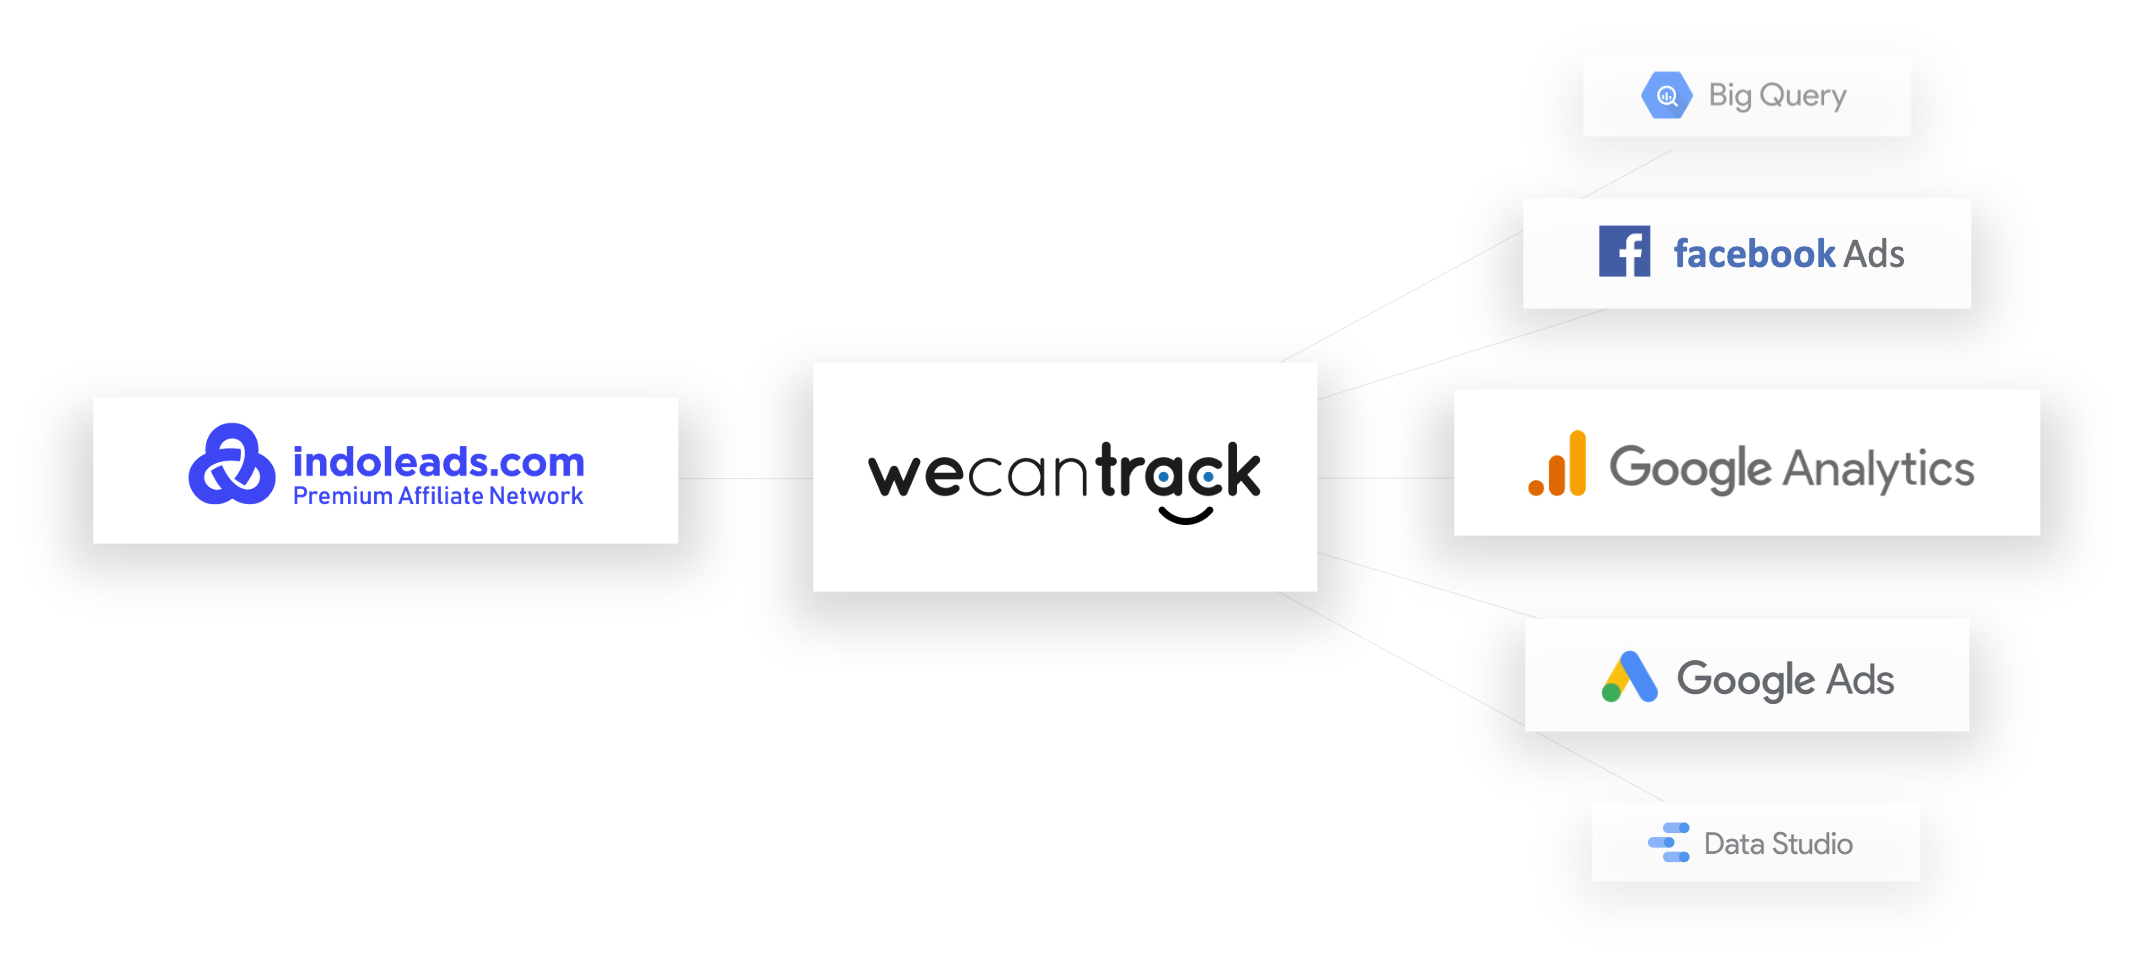 connect-indoleads-via-postback-url